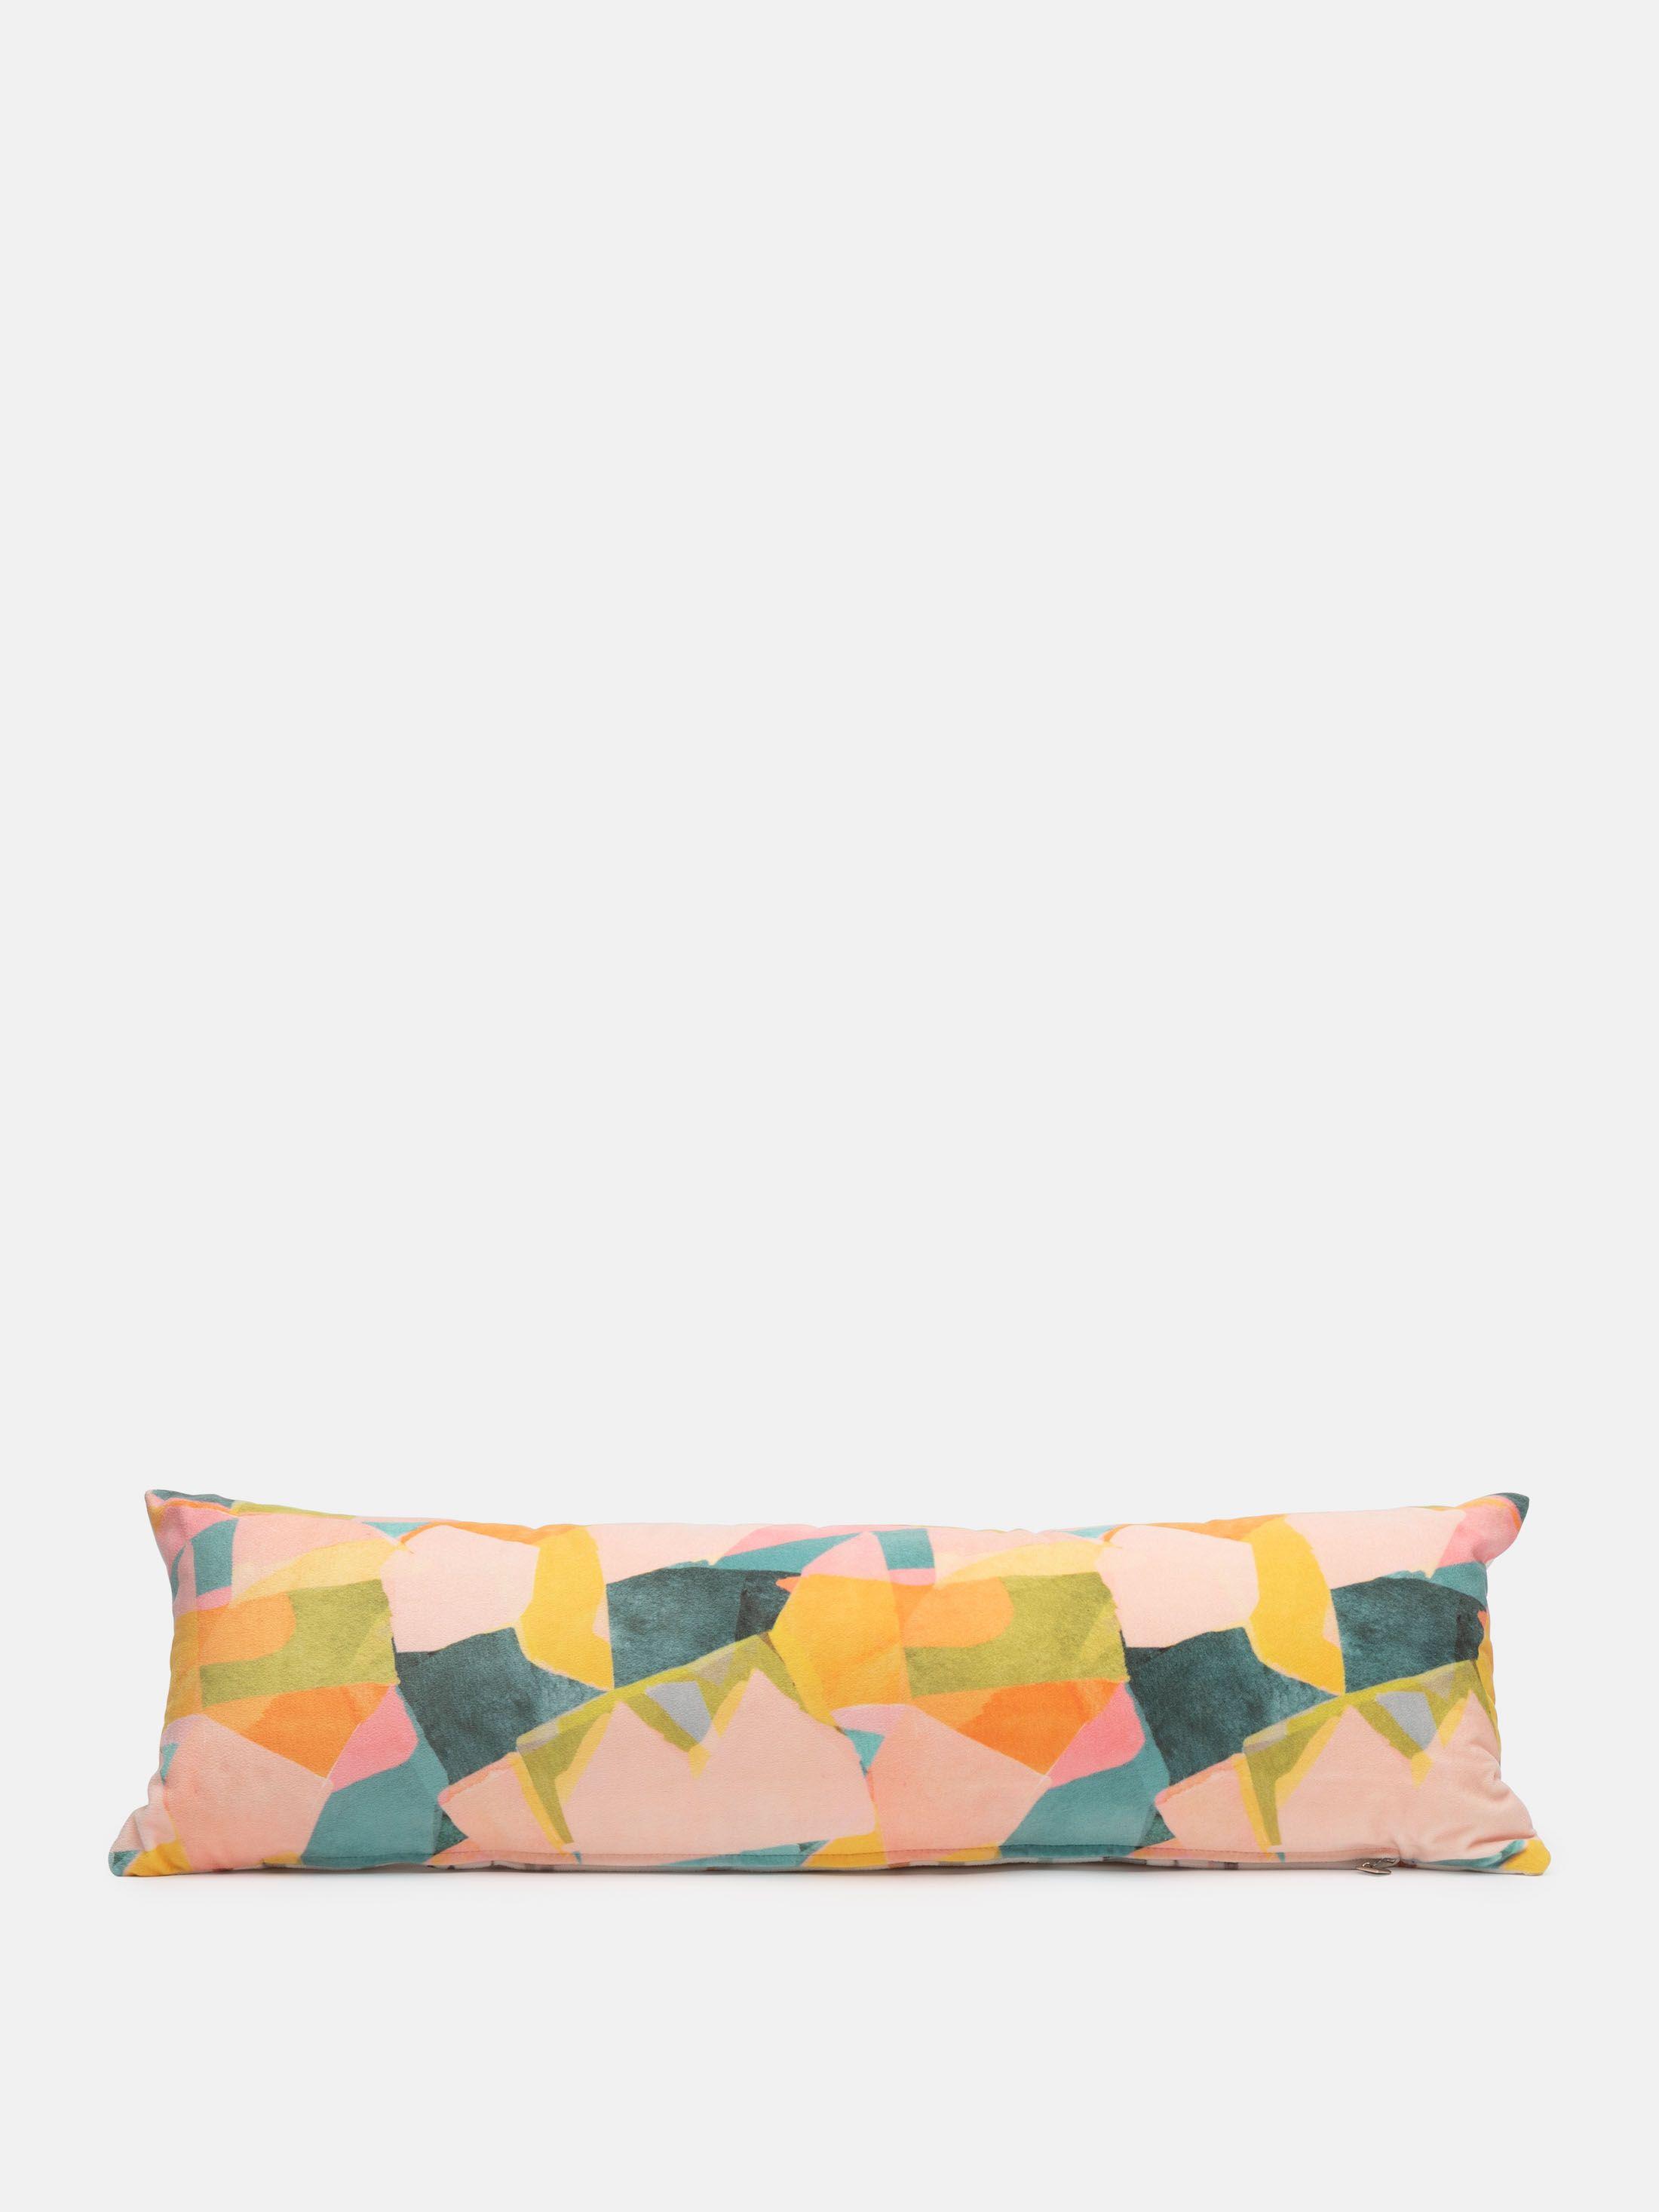 Custom Bolster Cushions